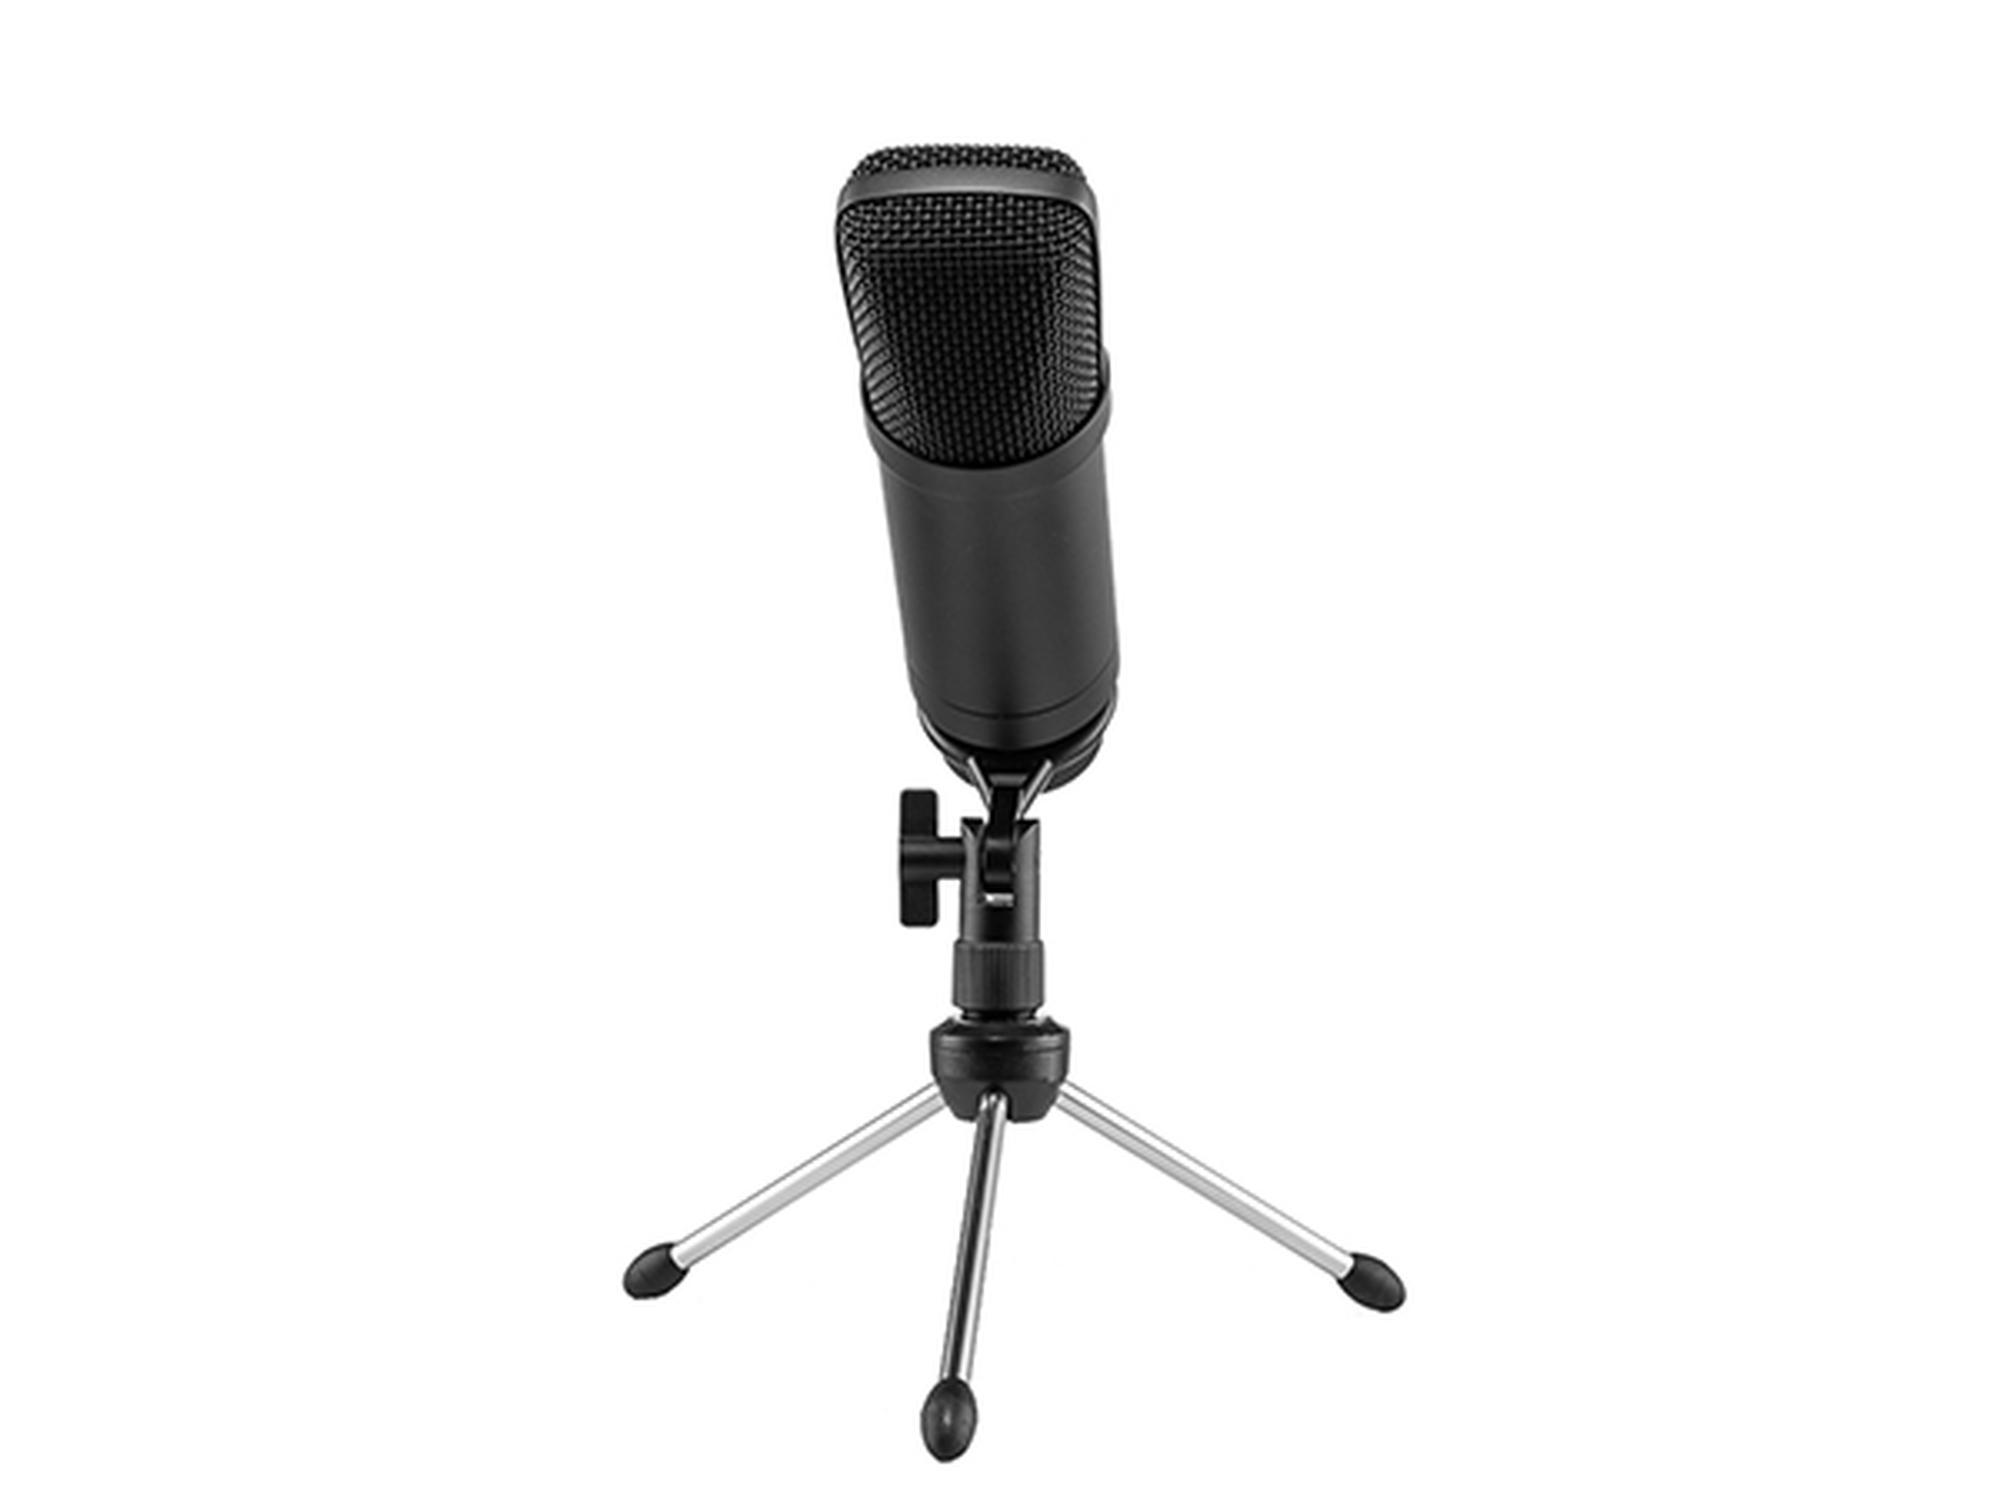 Sandberg 126-09 Microfoons